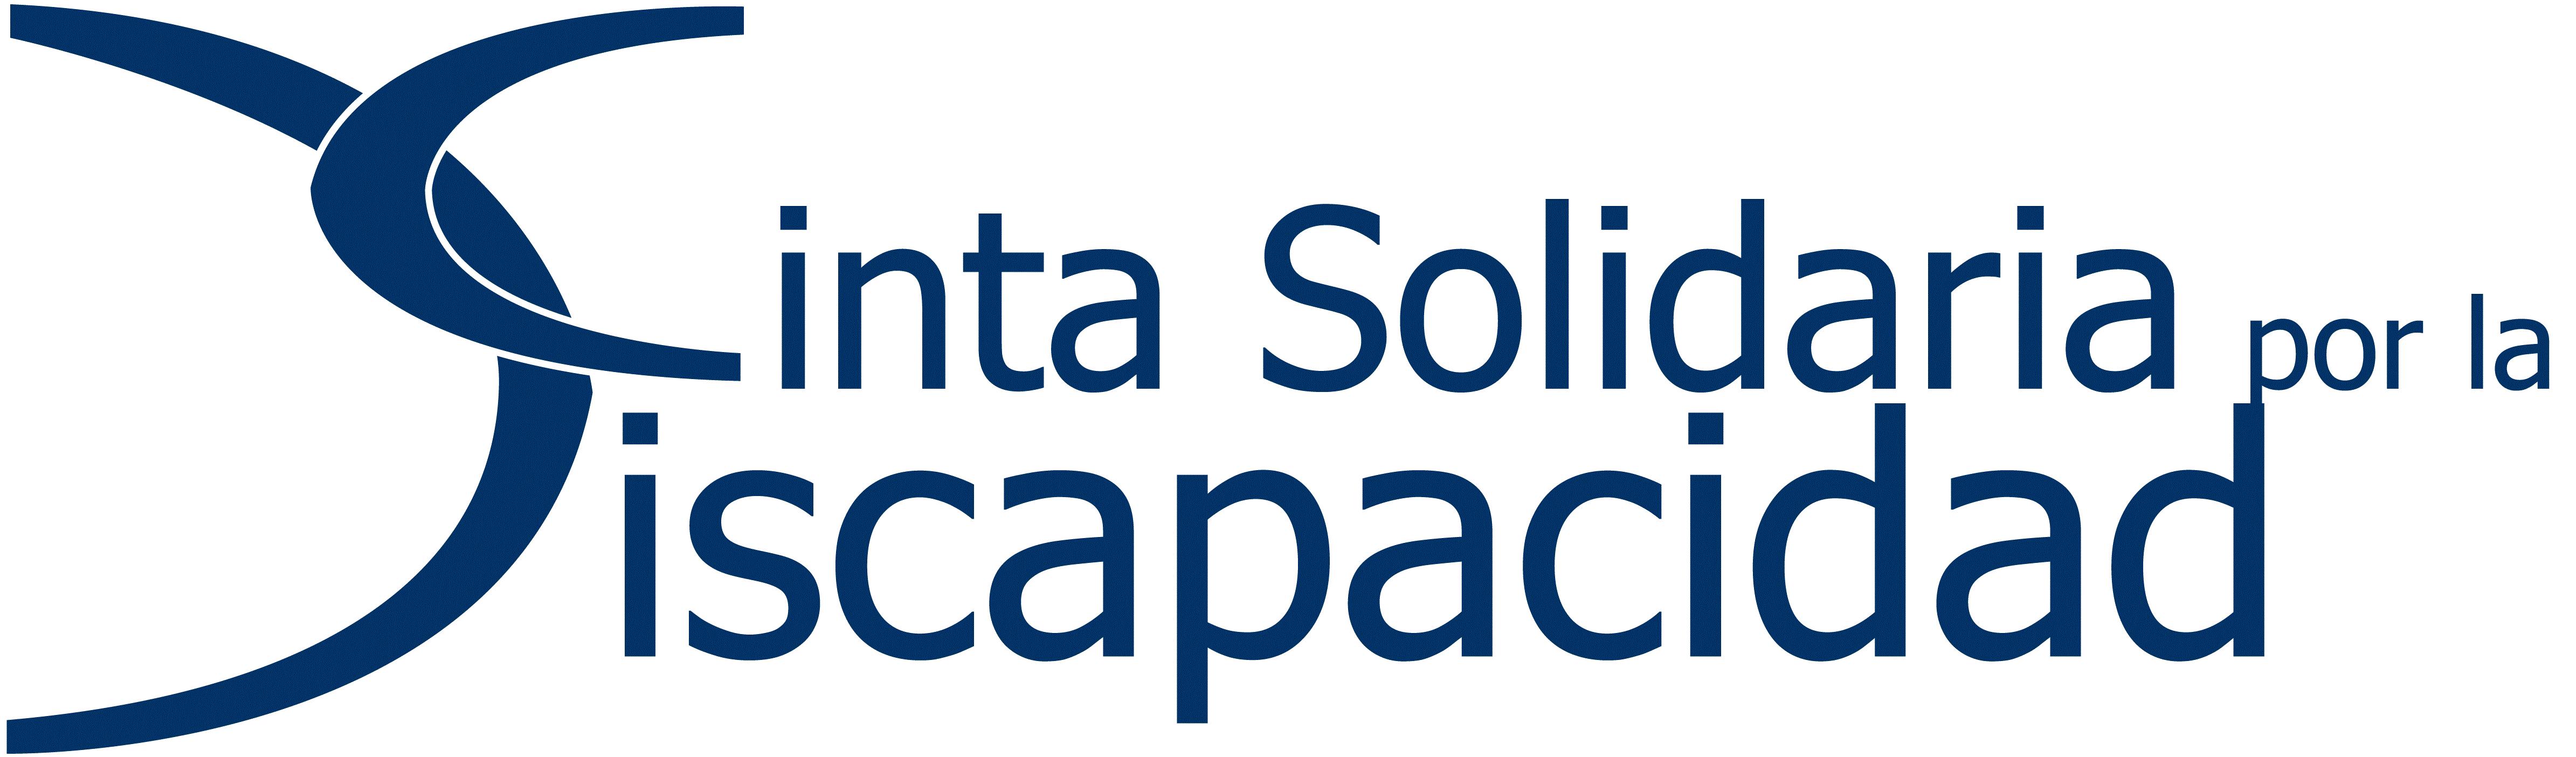 Logotipo Cinta Solidaria